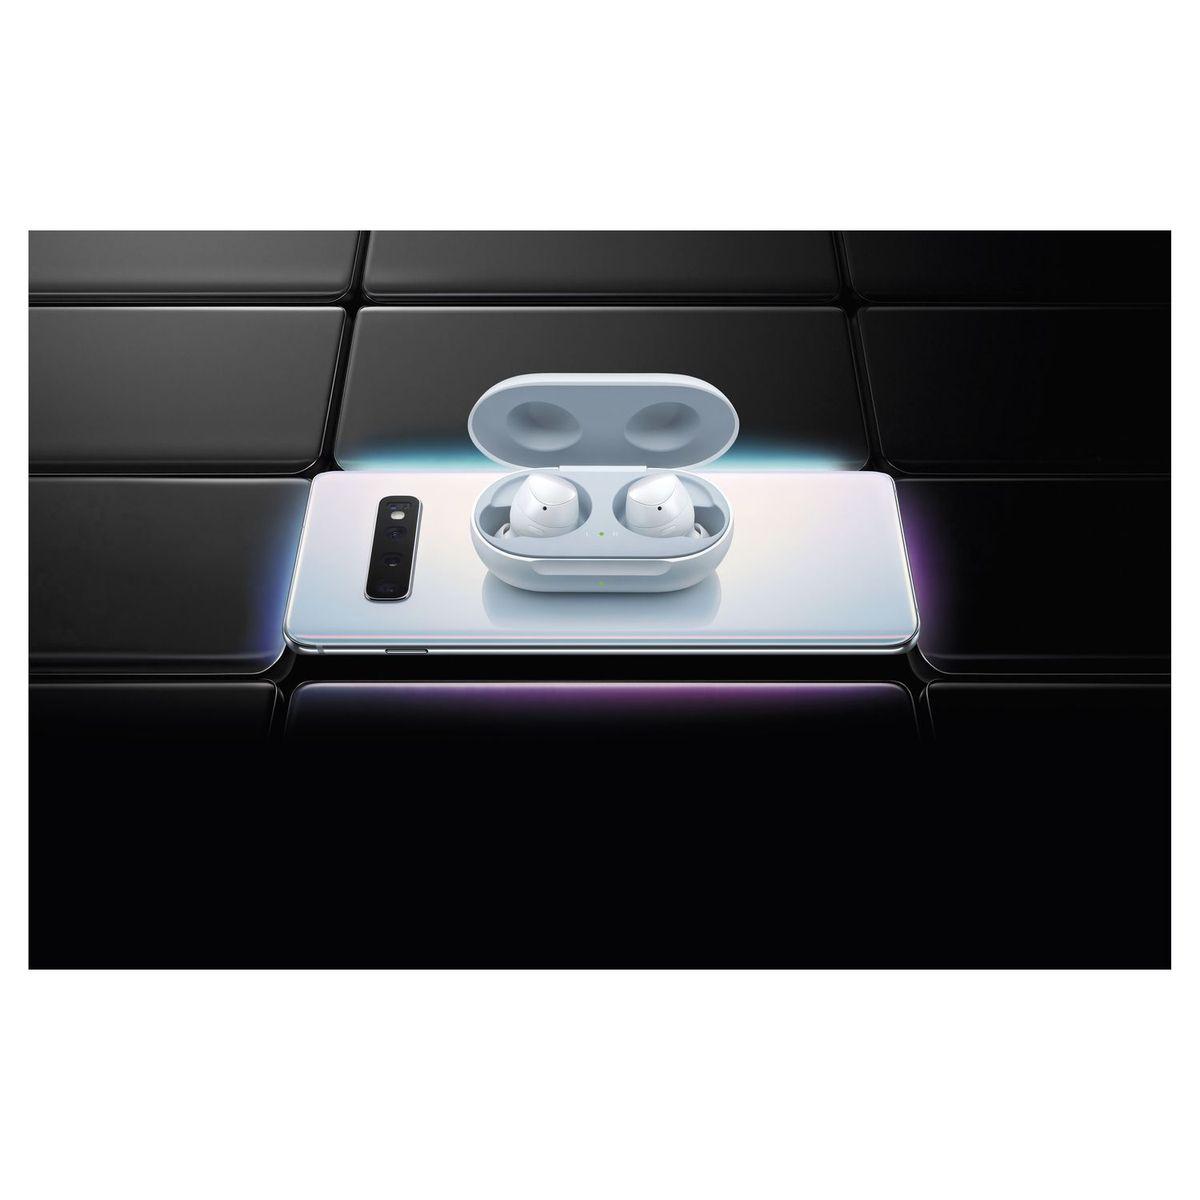 SAMSUNG Smartphone Galaxy S10 - 512 Go - 6.1 pouces - Vert Prisme - 4G